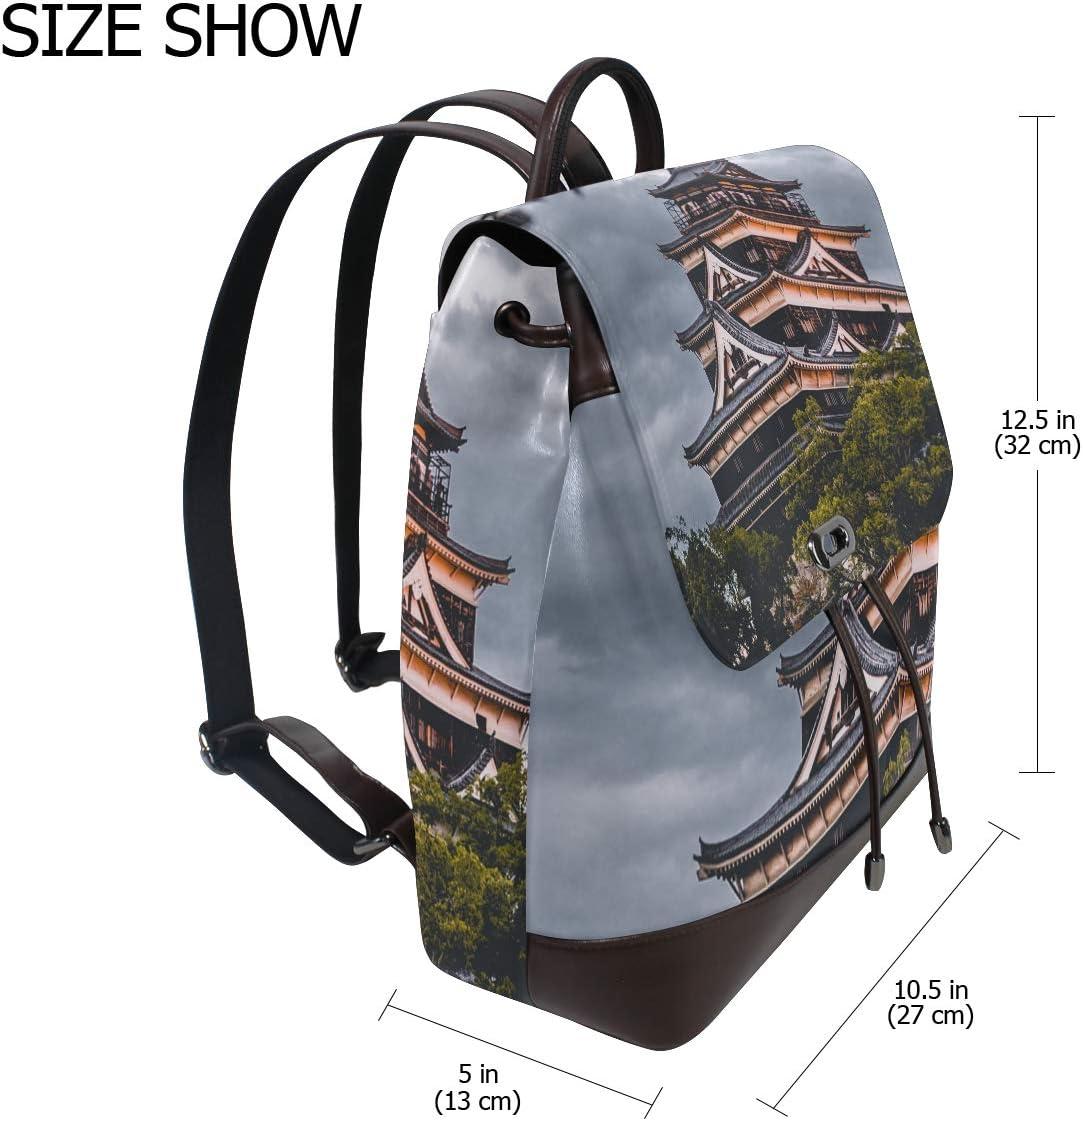 Travel Bag Storage Bag For Men Women Girls Boys Personalized Pattern Himeji Castle Backpack School Bag Shopping Bag